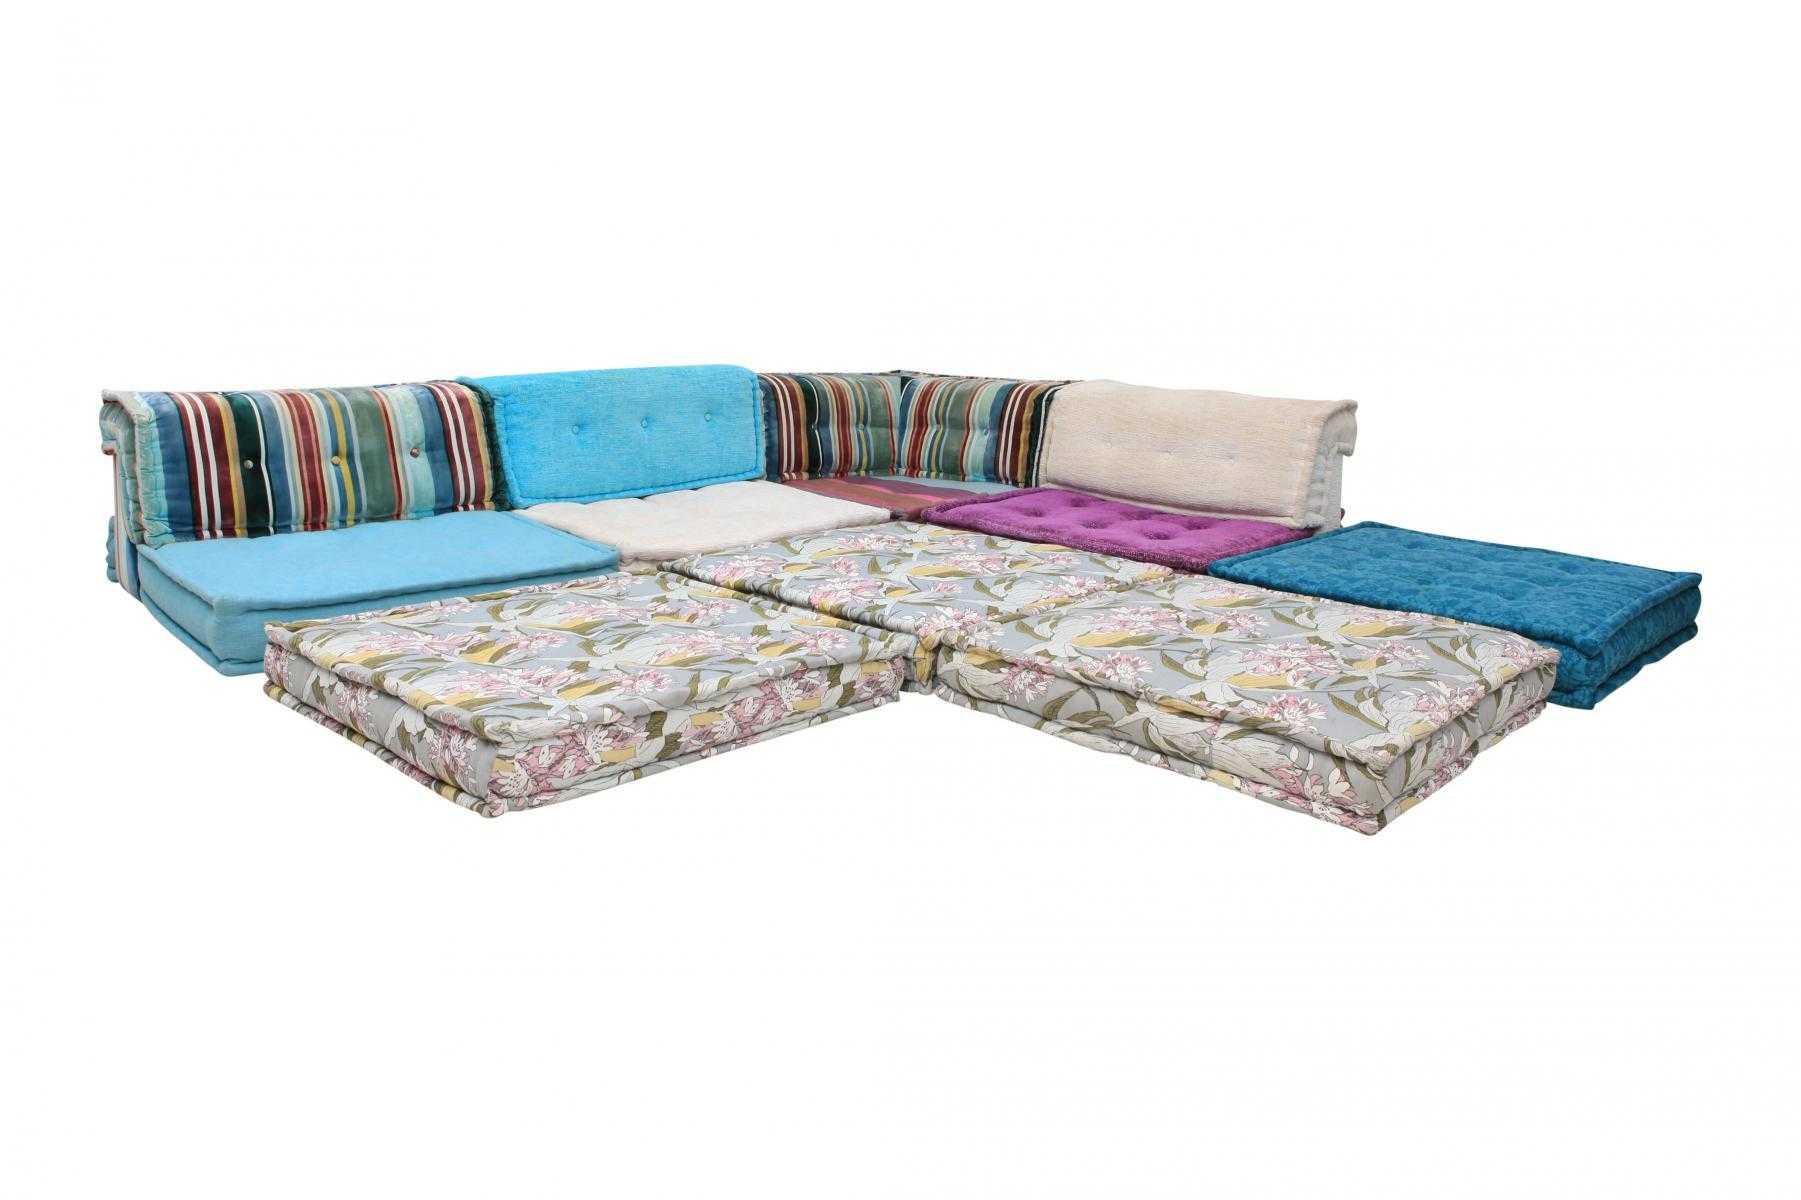 roche bobois mah jong modular sofa preis as dining room seating online shop buy furniture lighting design